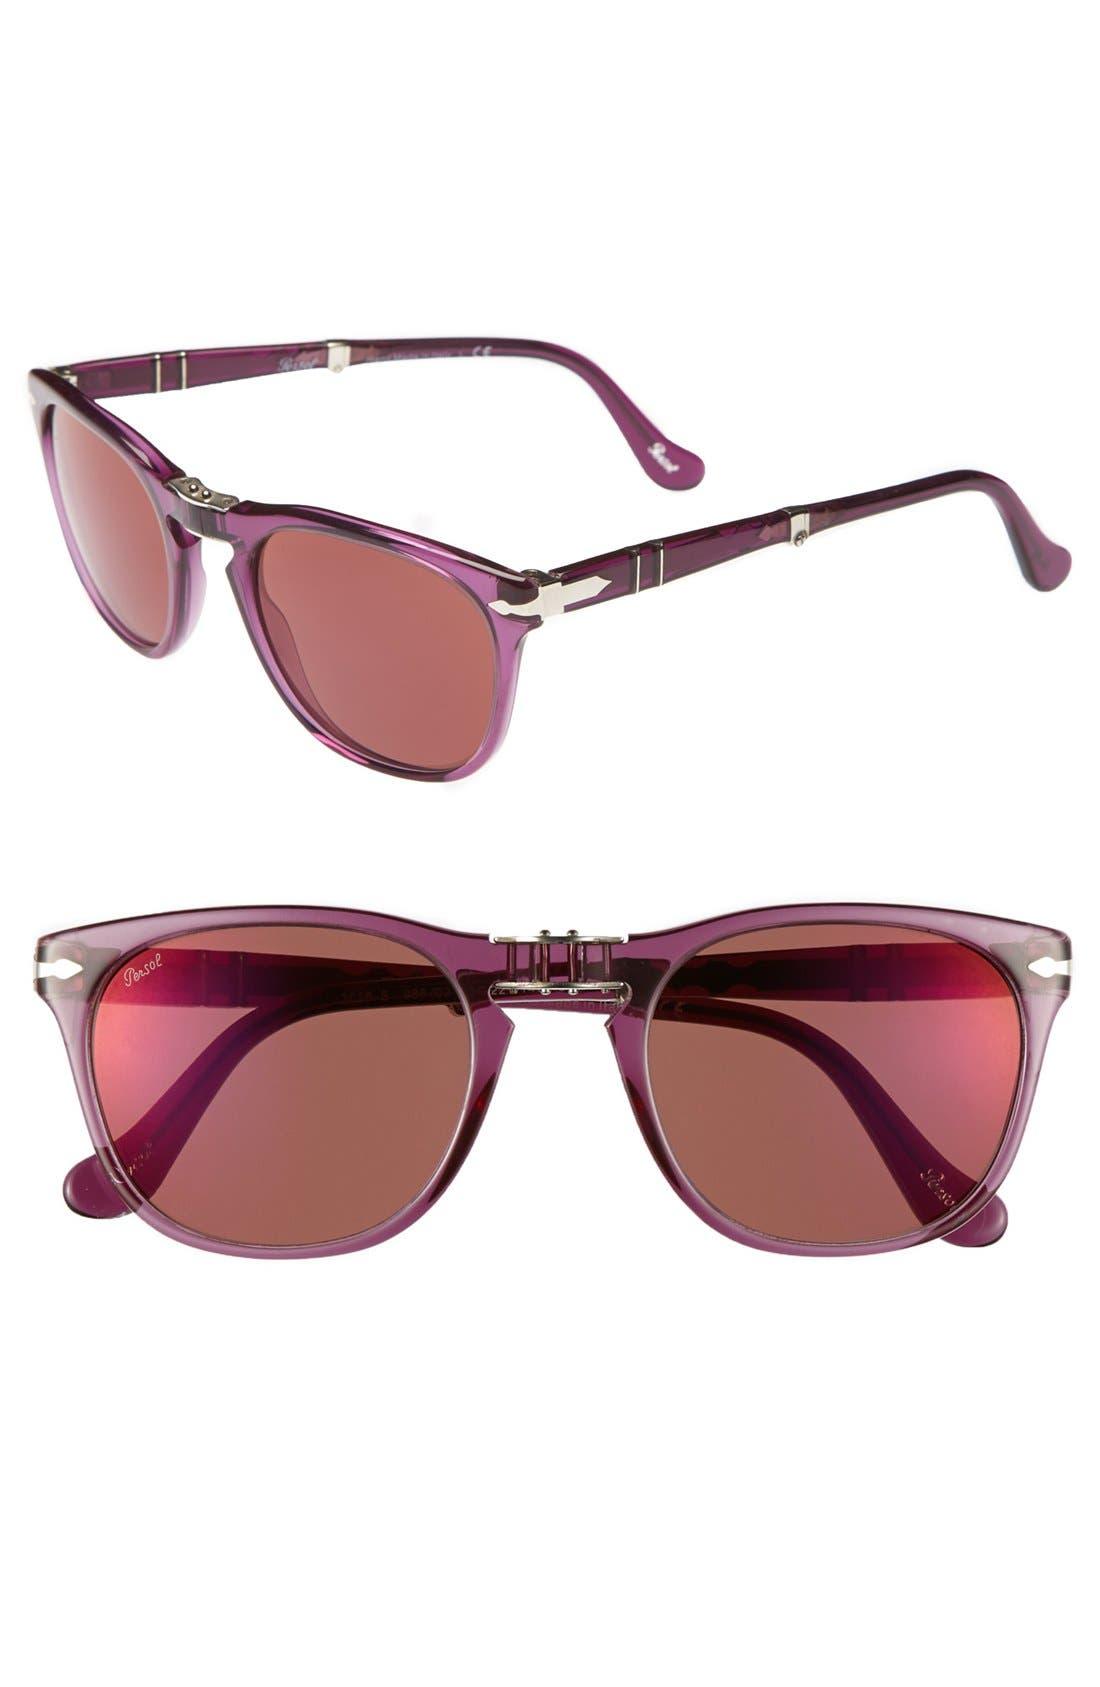 Alternate Image 1 Selected - Persol 52mm Folding Sunglasses